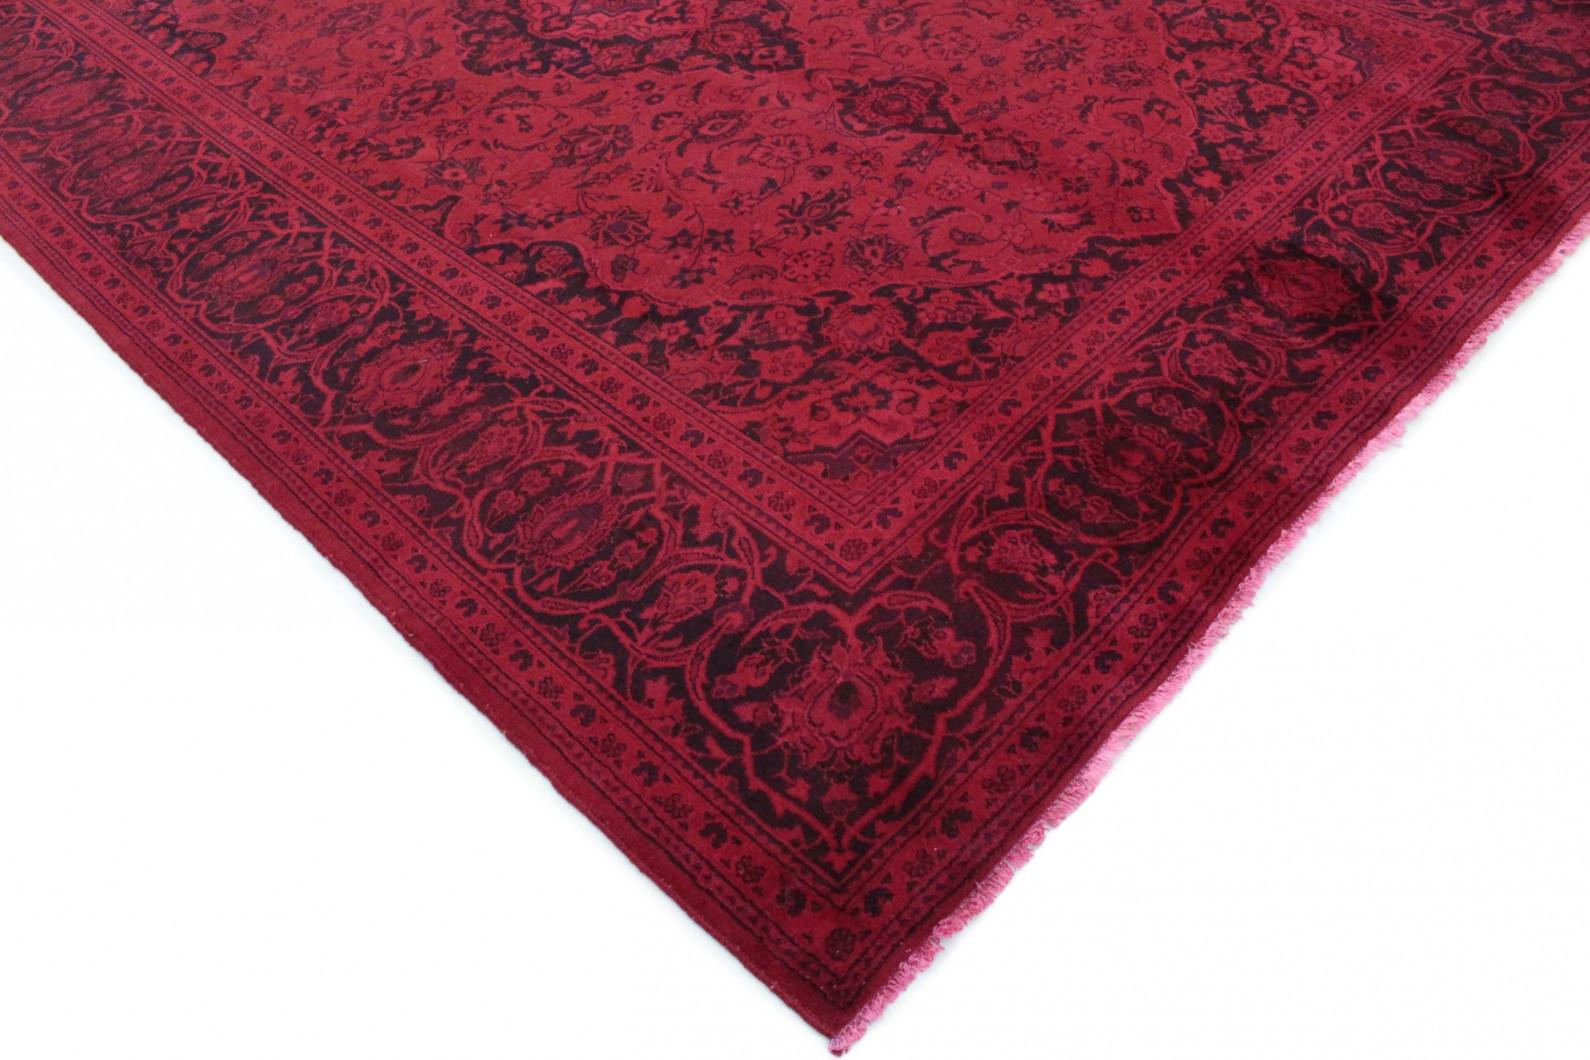 Vintage Teppich Rot In 350x240 1001 167052 Bei Carpetido